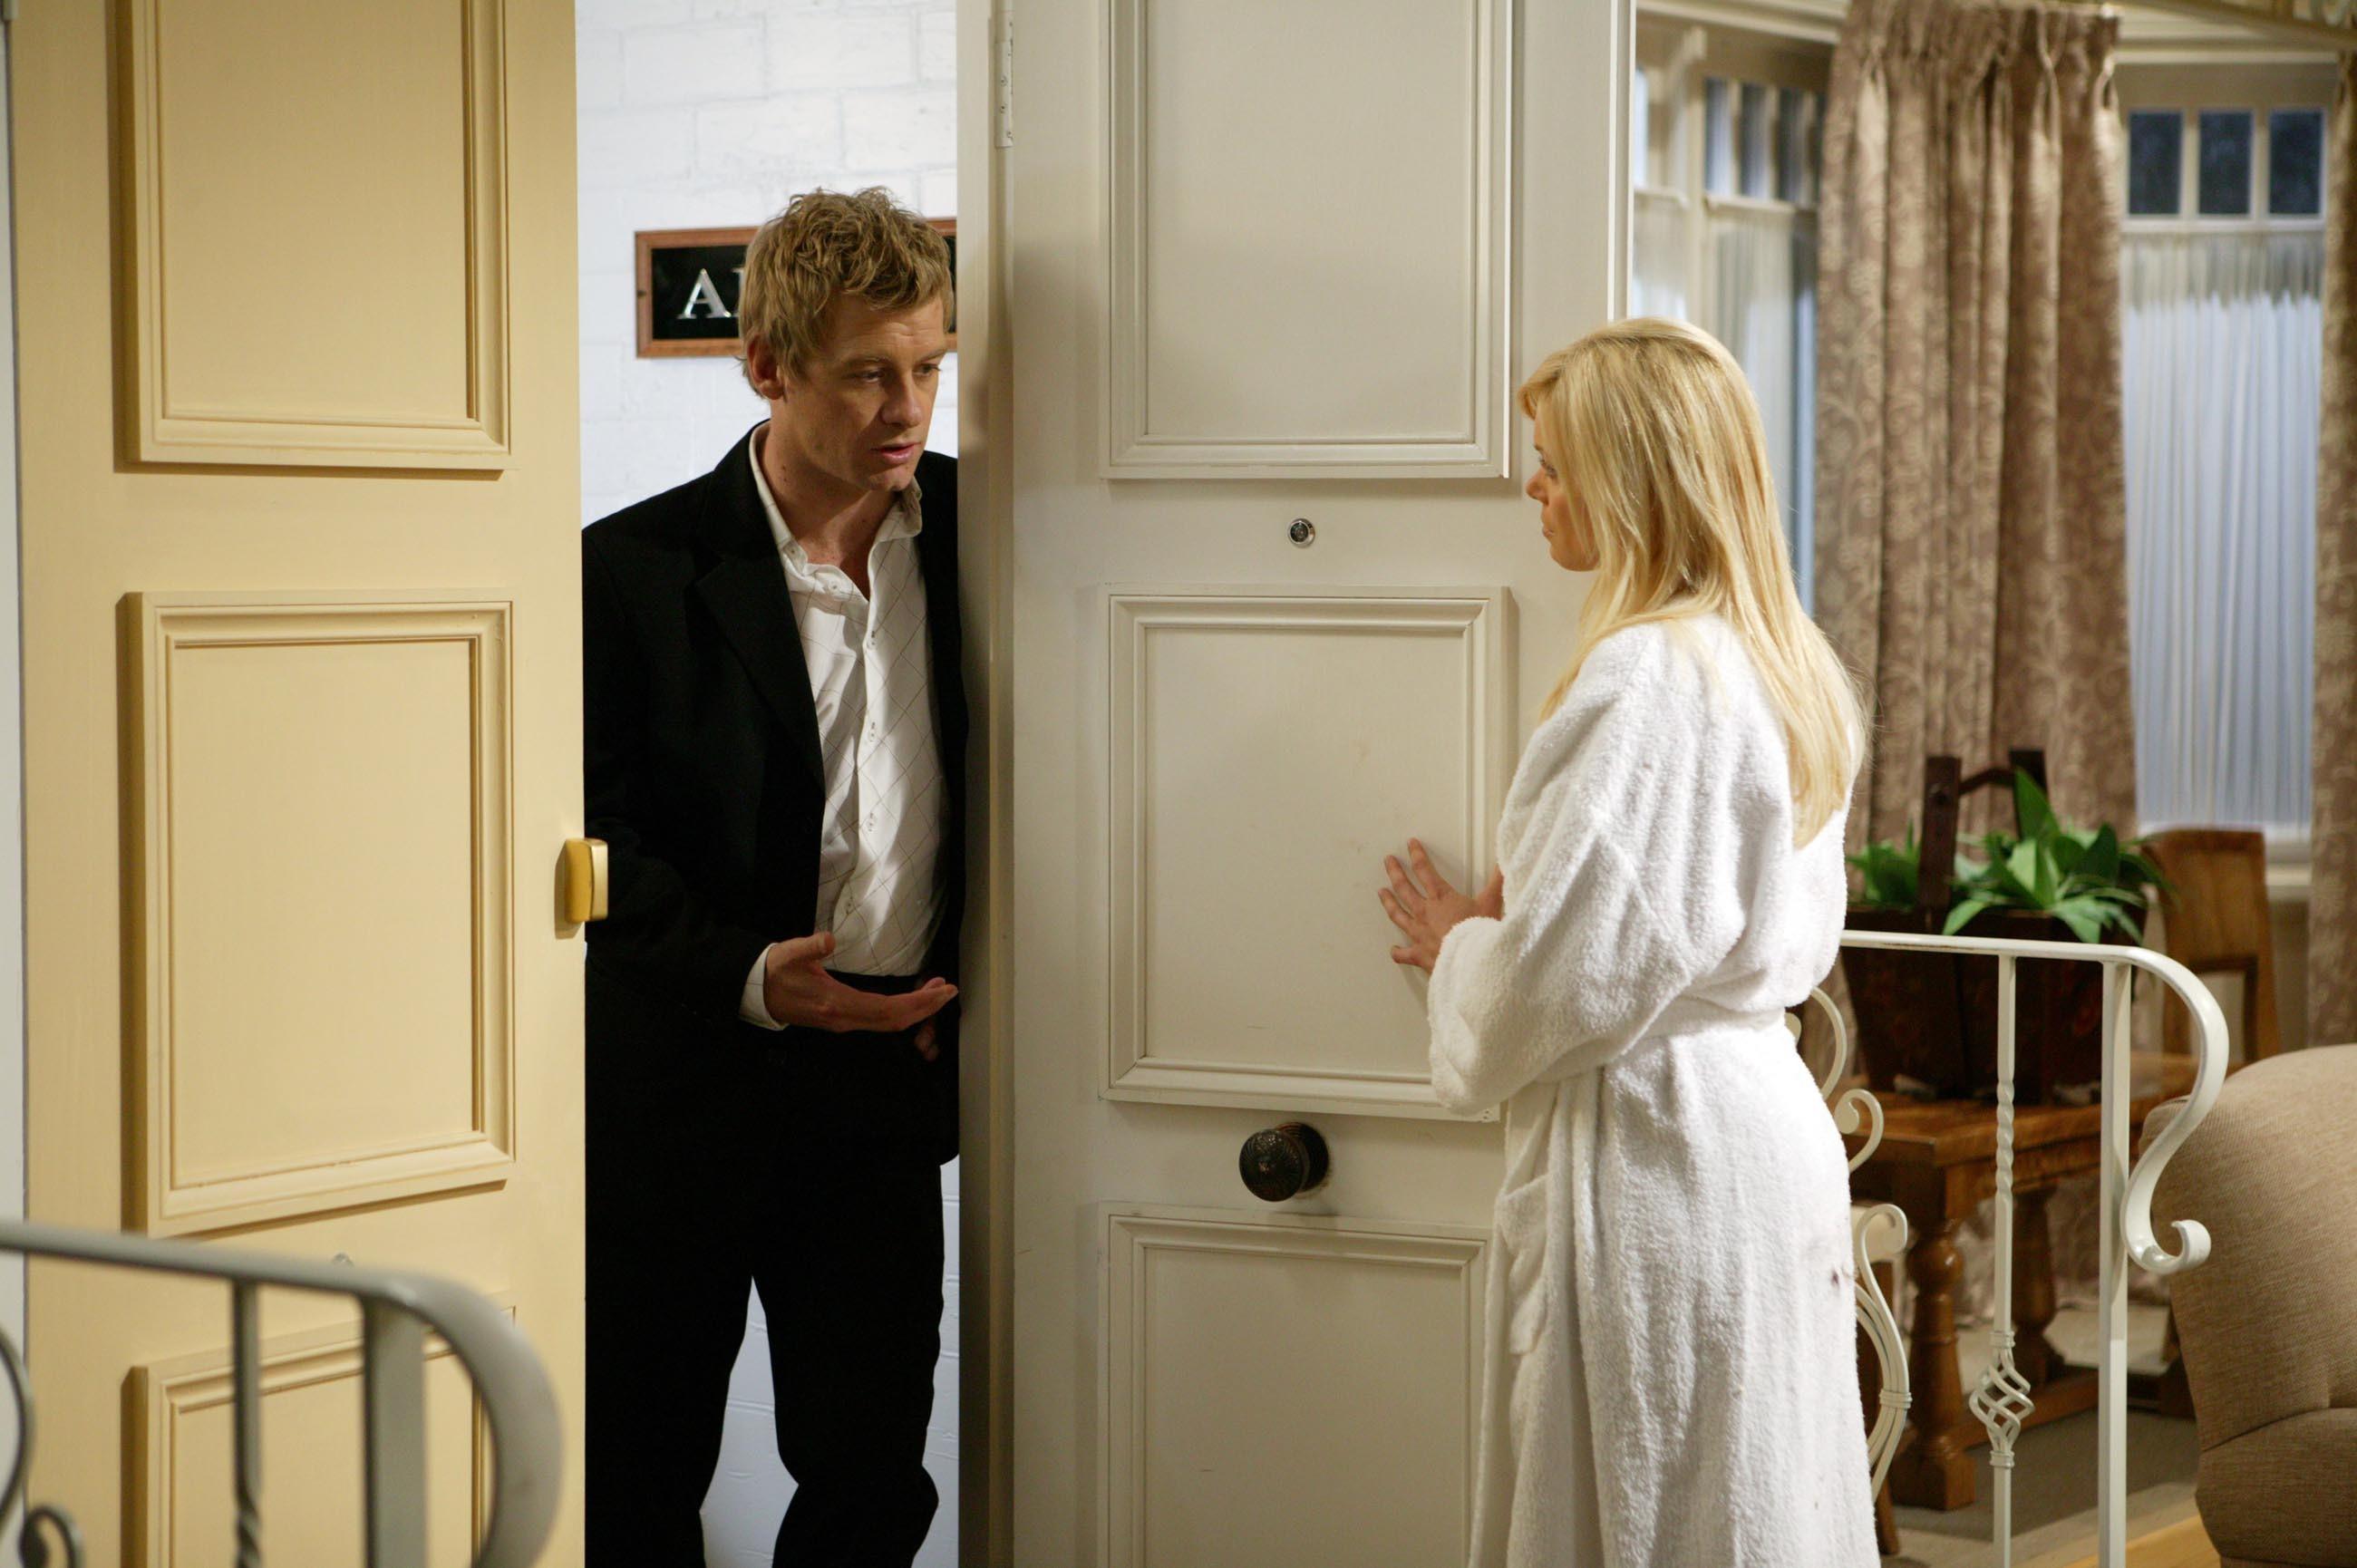 Can Peter and Amanda make amends?